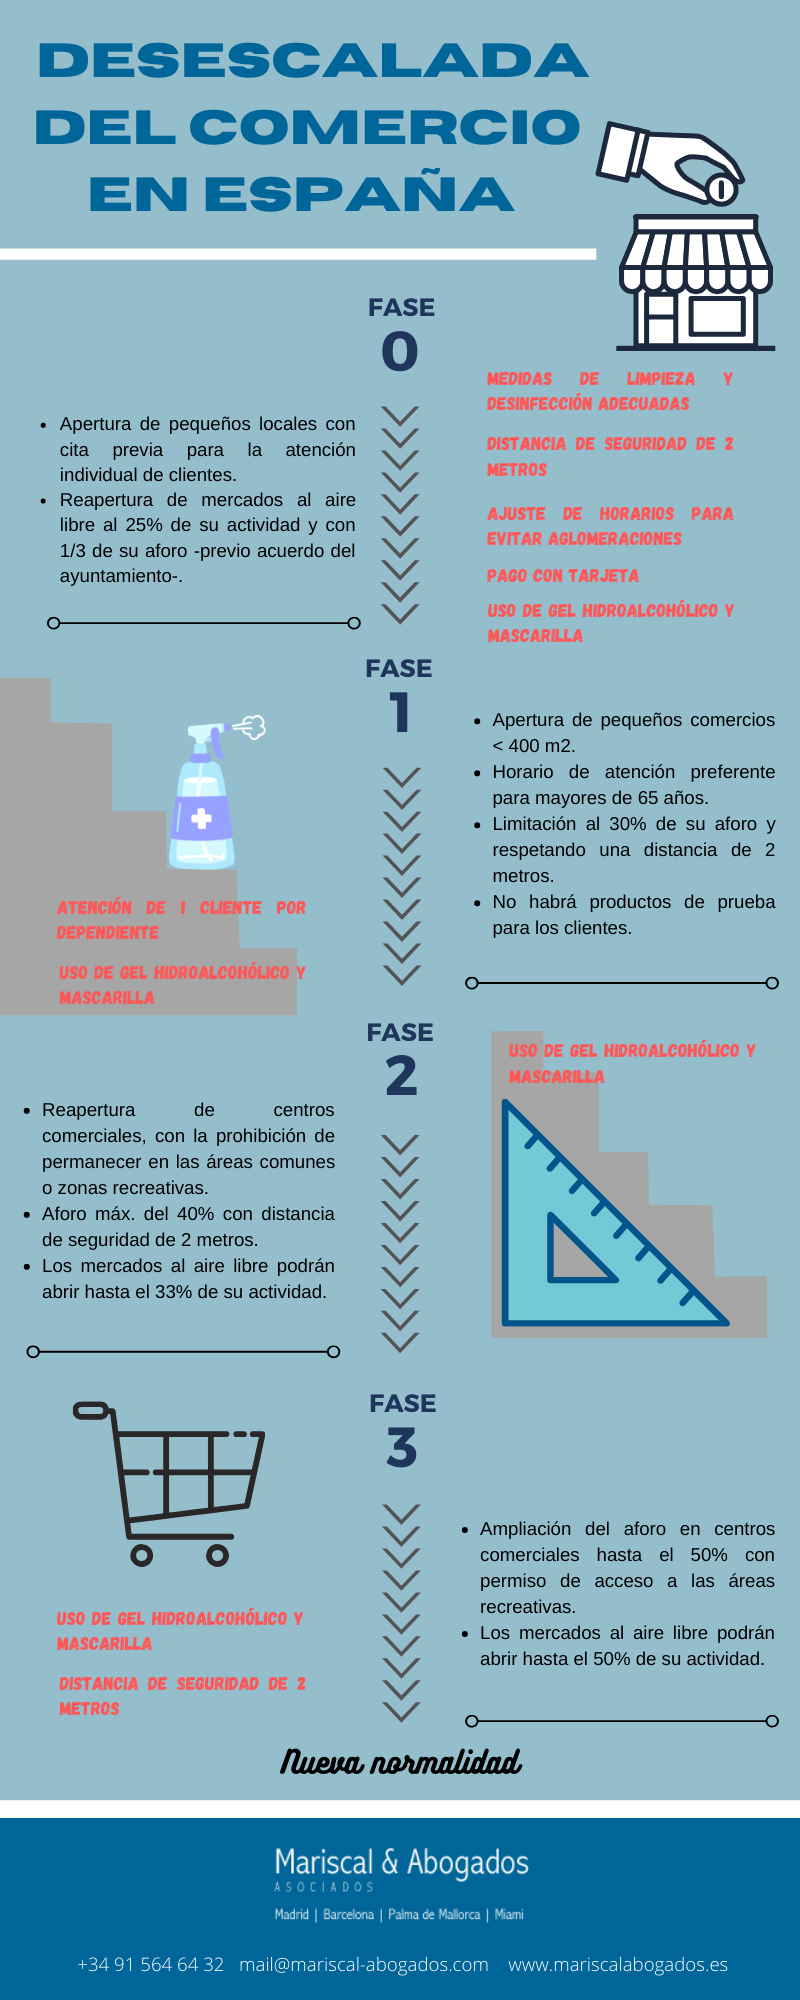 37 2020 Desescalada del comercio en España